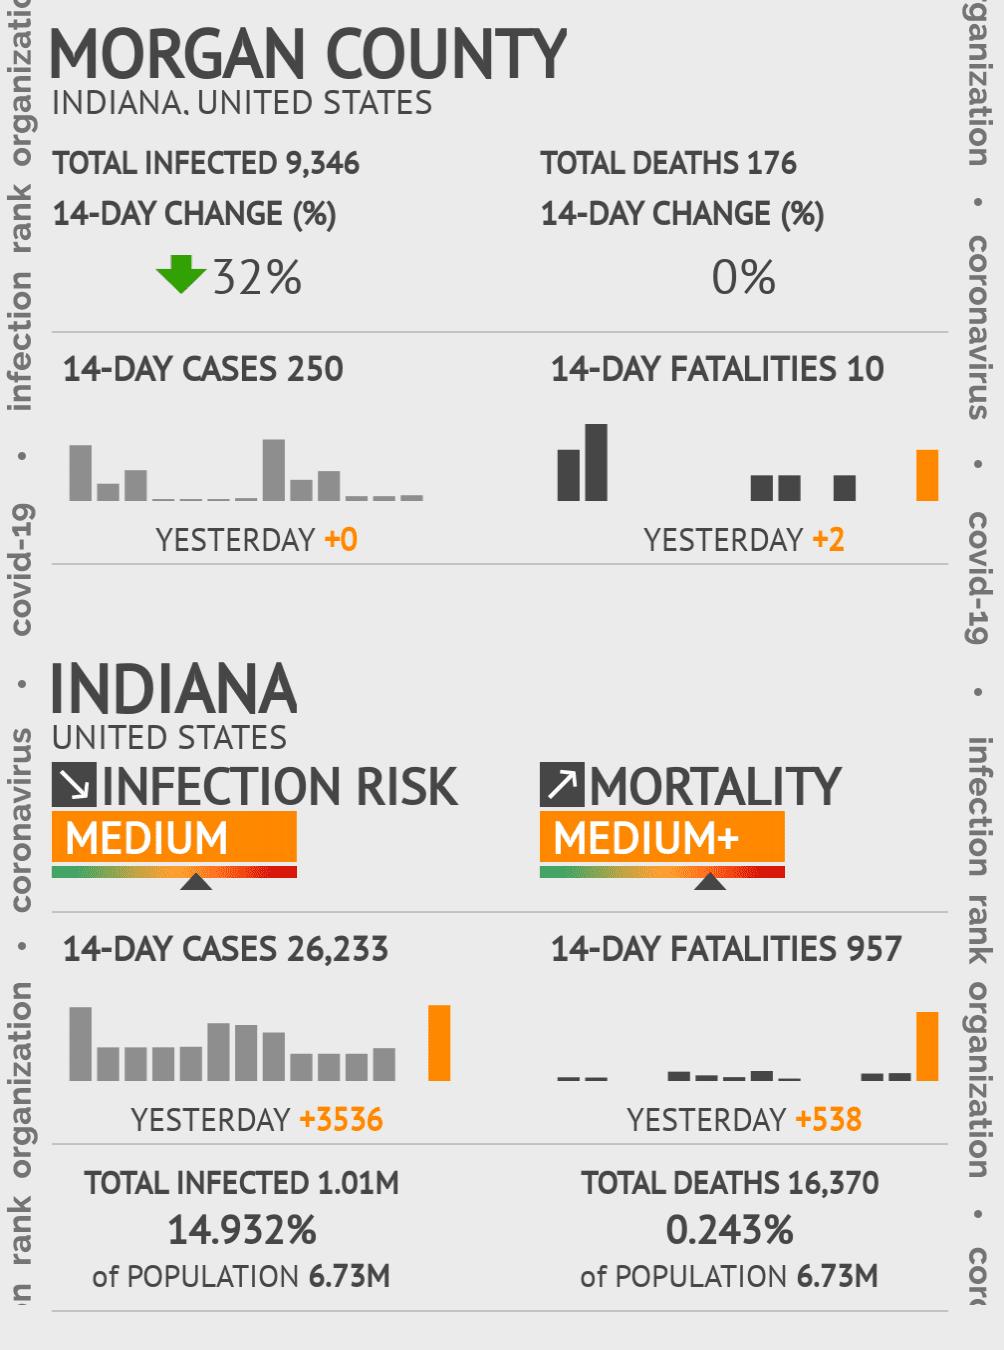 Morgan County Coronavirus Covid-19 Risk of Infection on November 24, 2020